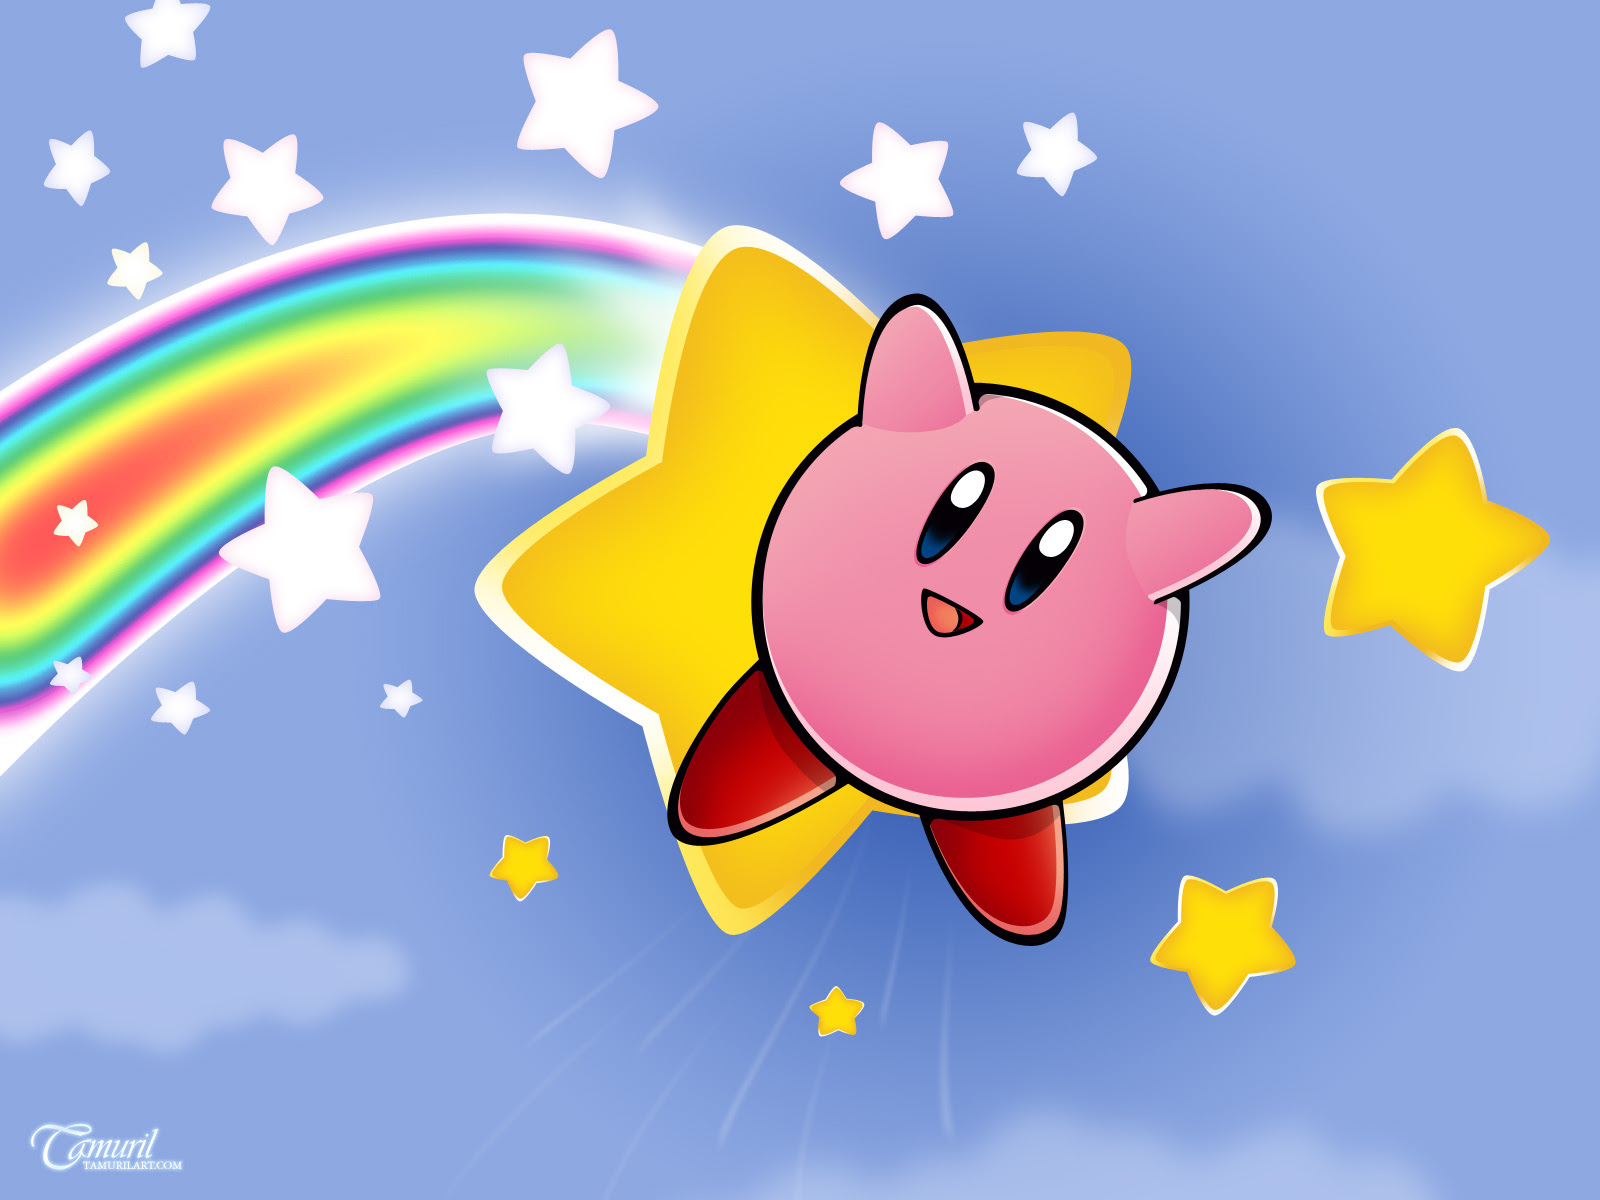 Another Kirby Wallpaper Kirbyfans Wallpaper 34568960 Fanpop